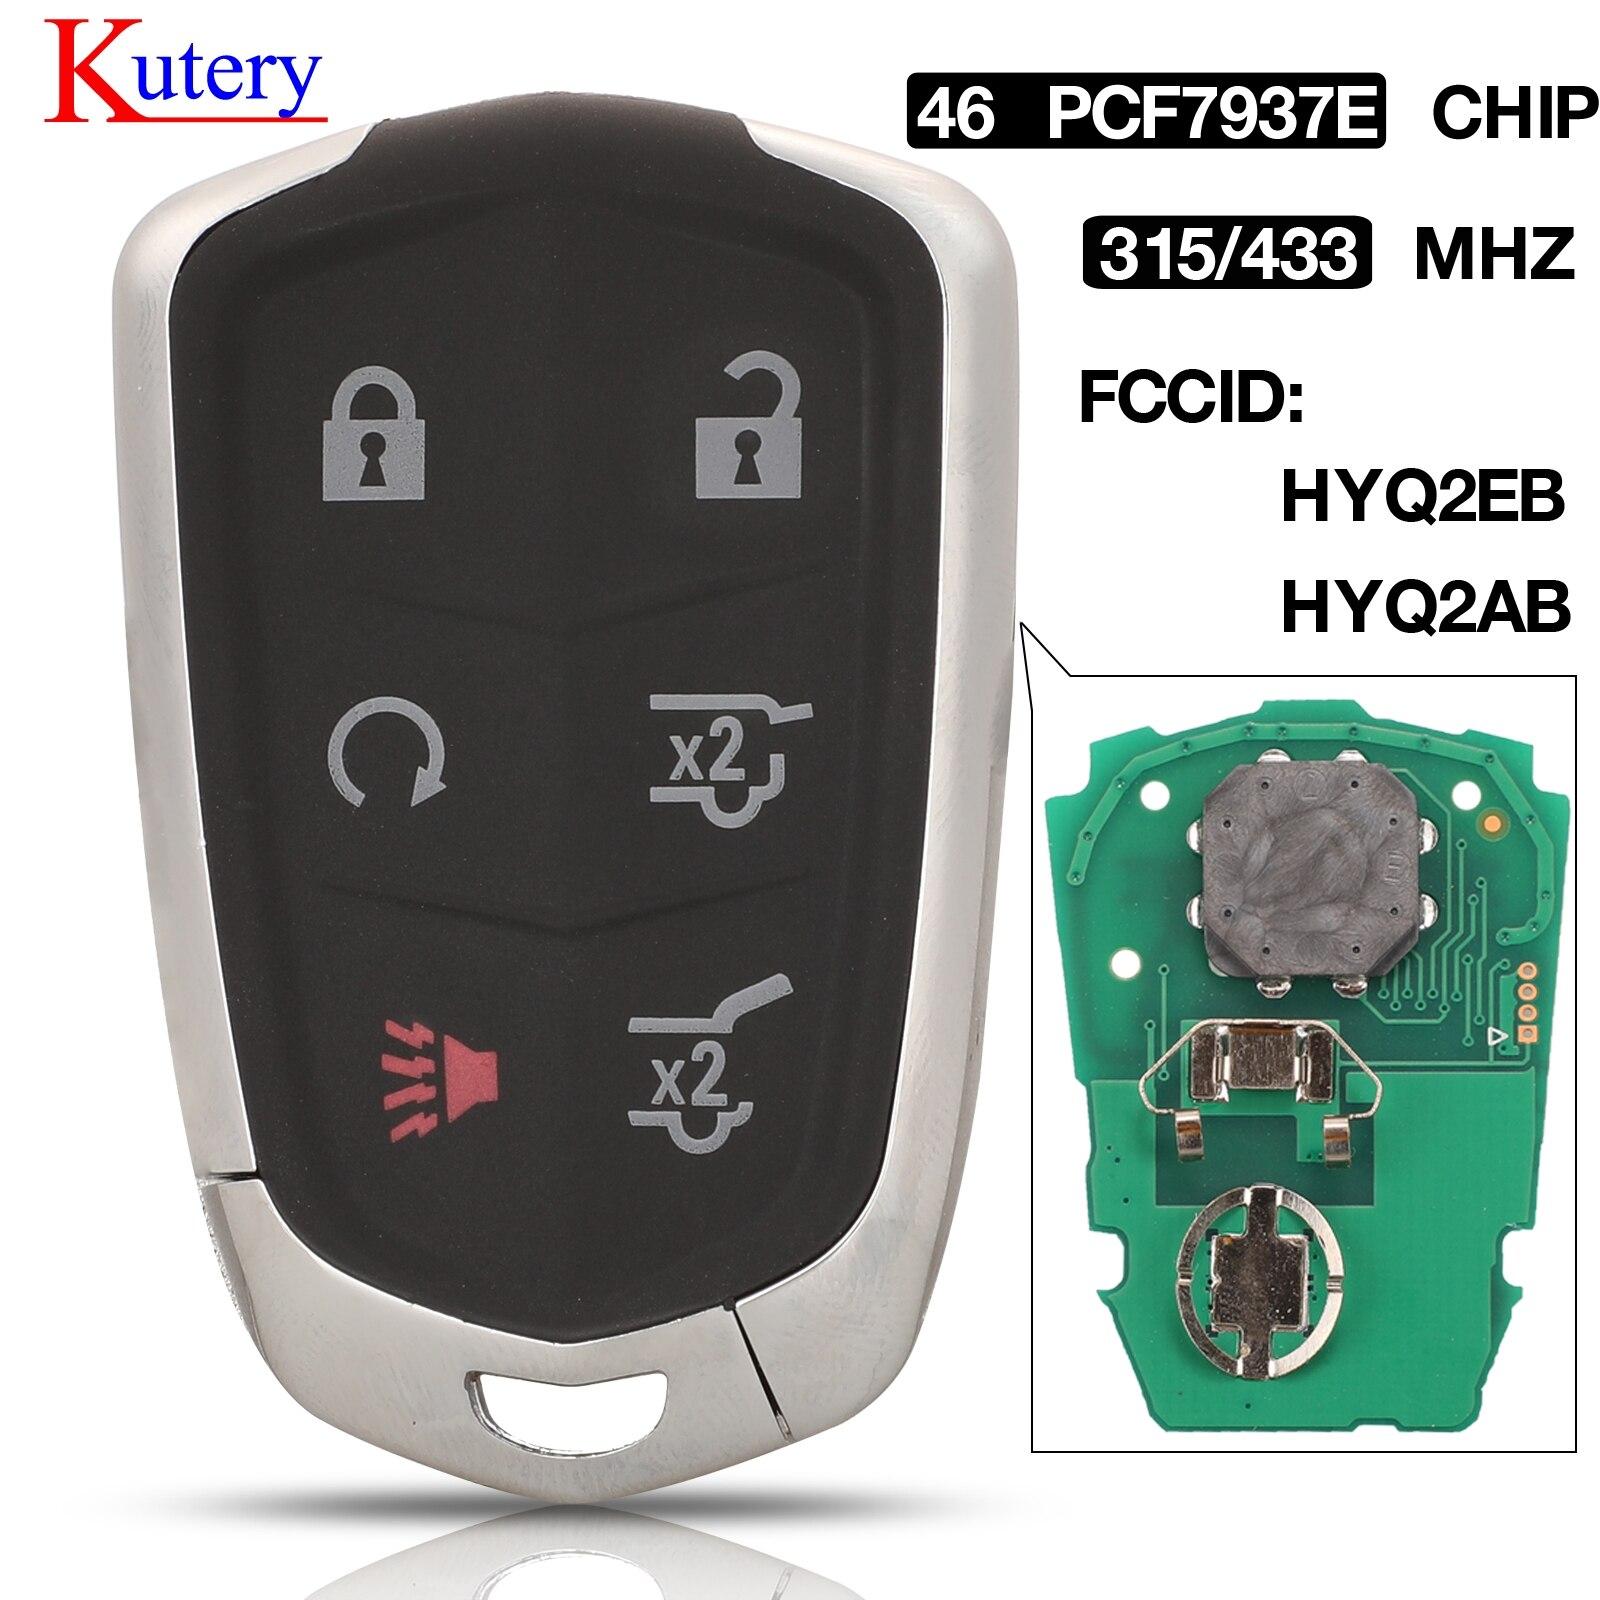 Kutery 6 botões hyq2ab chave do carro remoto inteligente 315 mhz hyq2eb 433 mhz id46 chip para cadillac escalade esv 2015 2016 2017 2018 2019